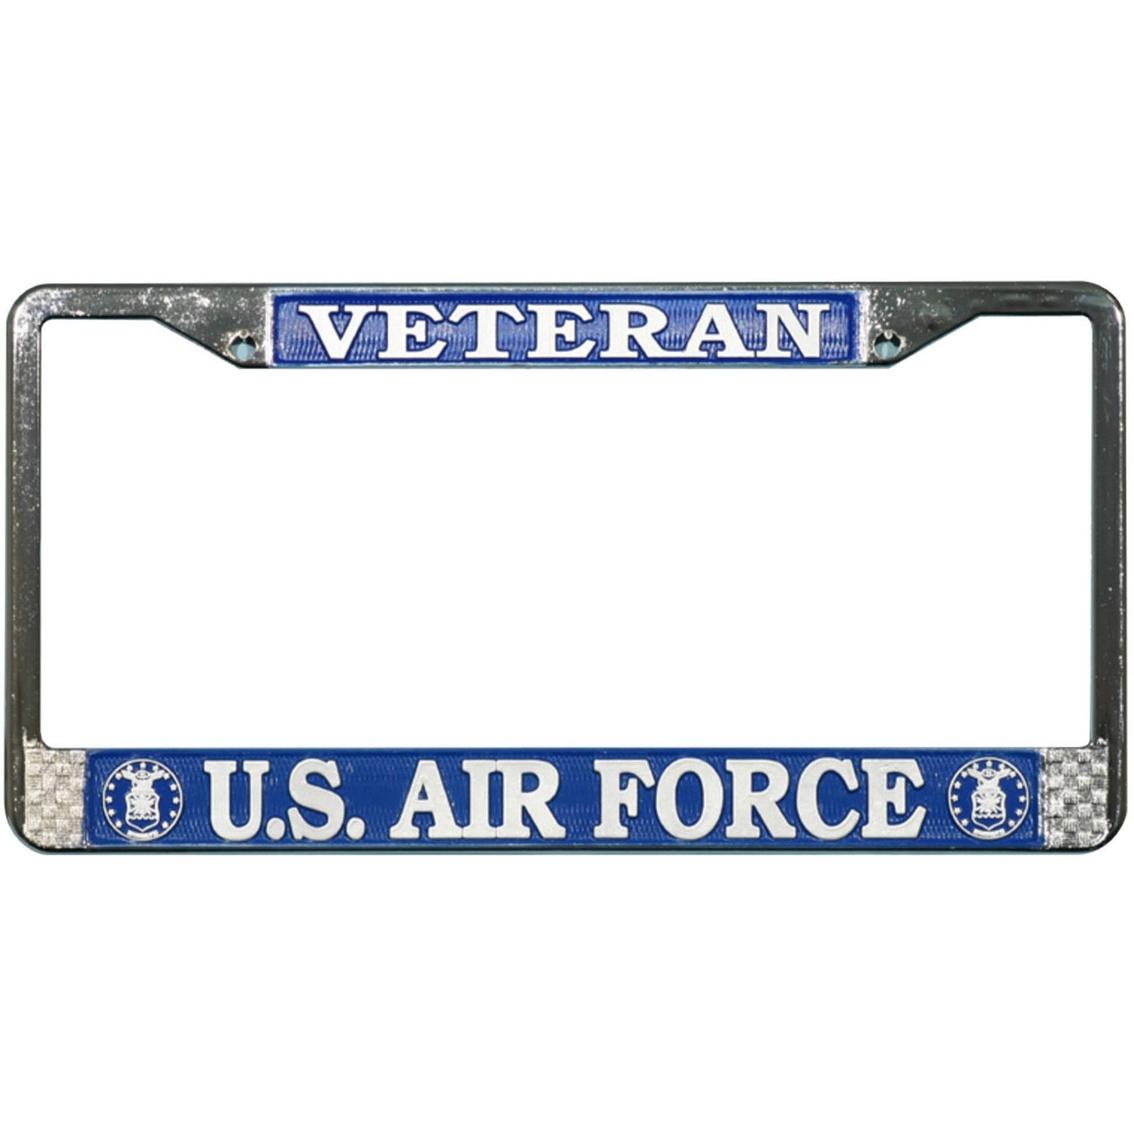 Mitchell Proffitt Air Force Veteran Chrome License Plate Frame